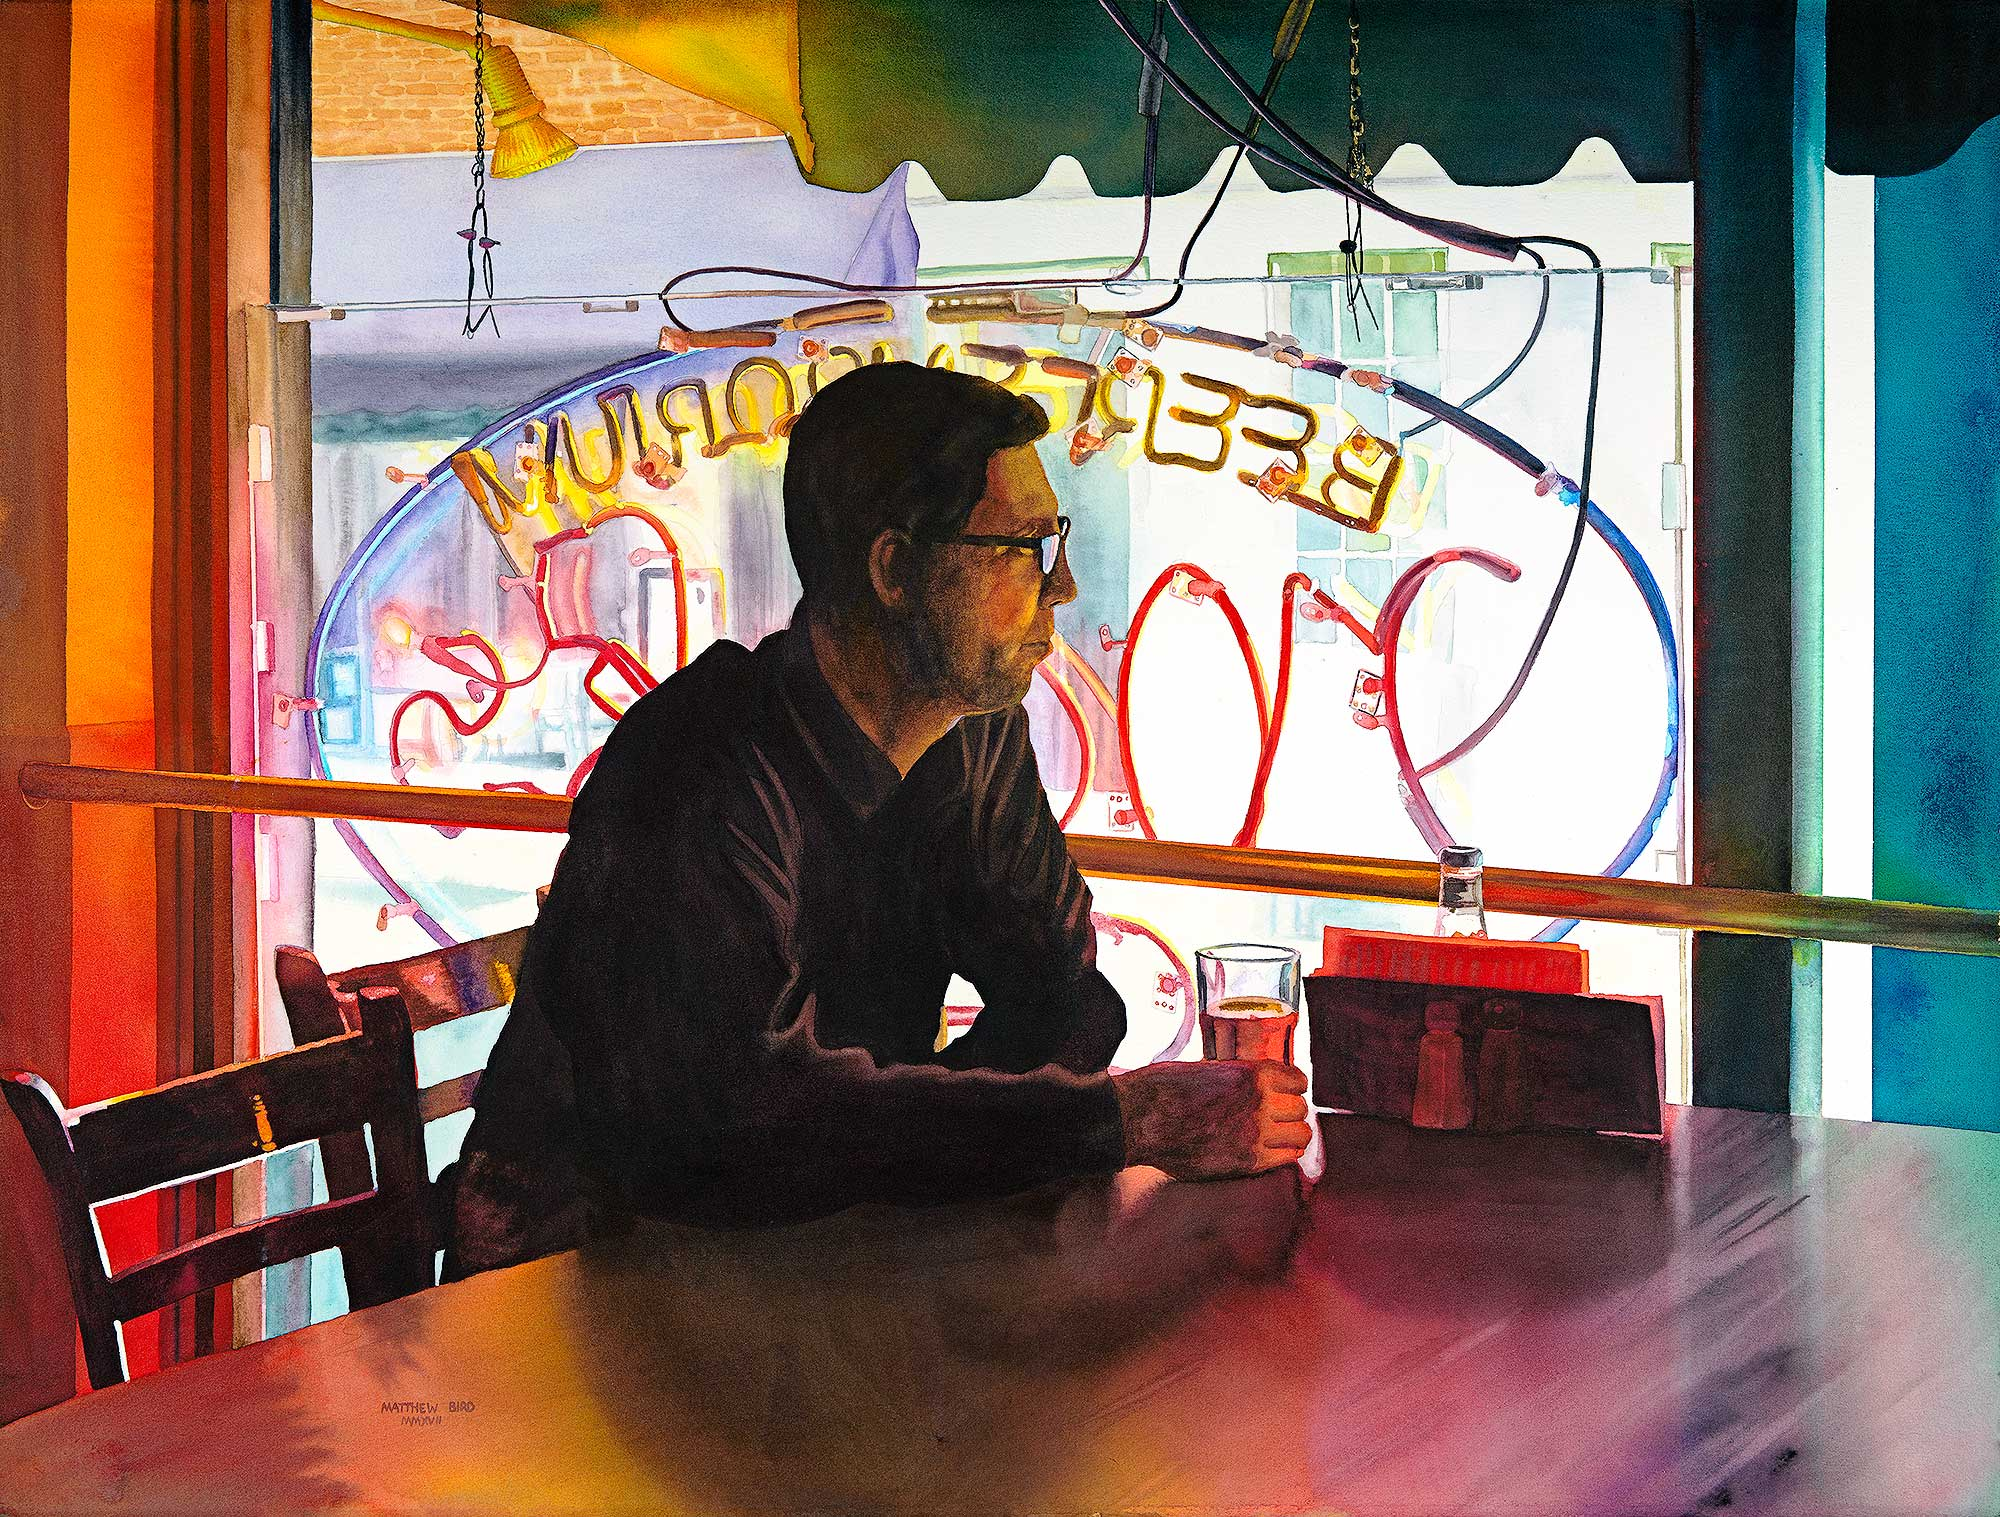 Matthew-Bird_Alone-At-Monks.jpg